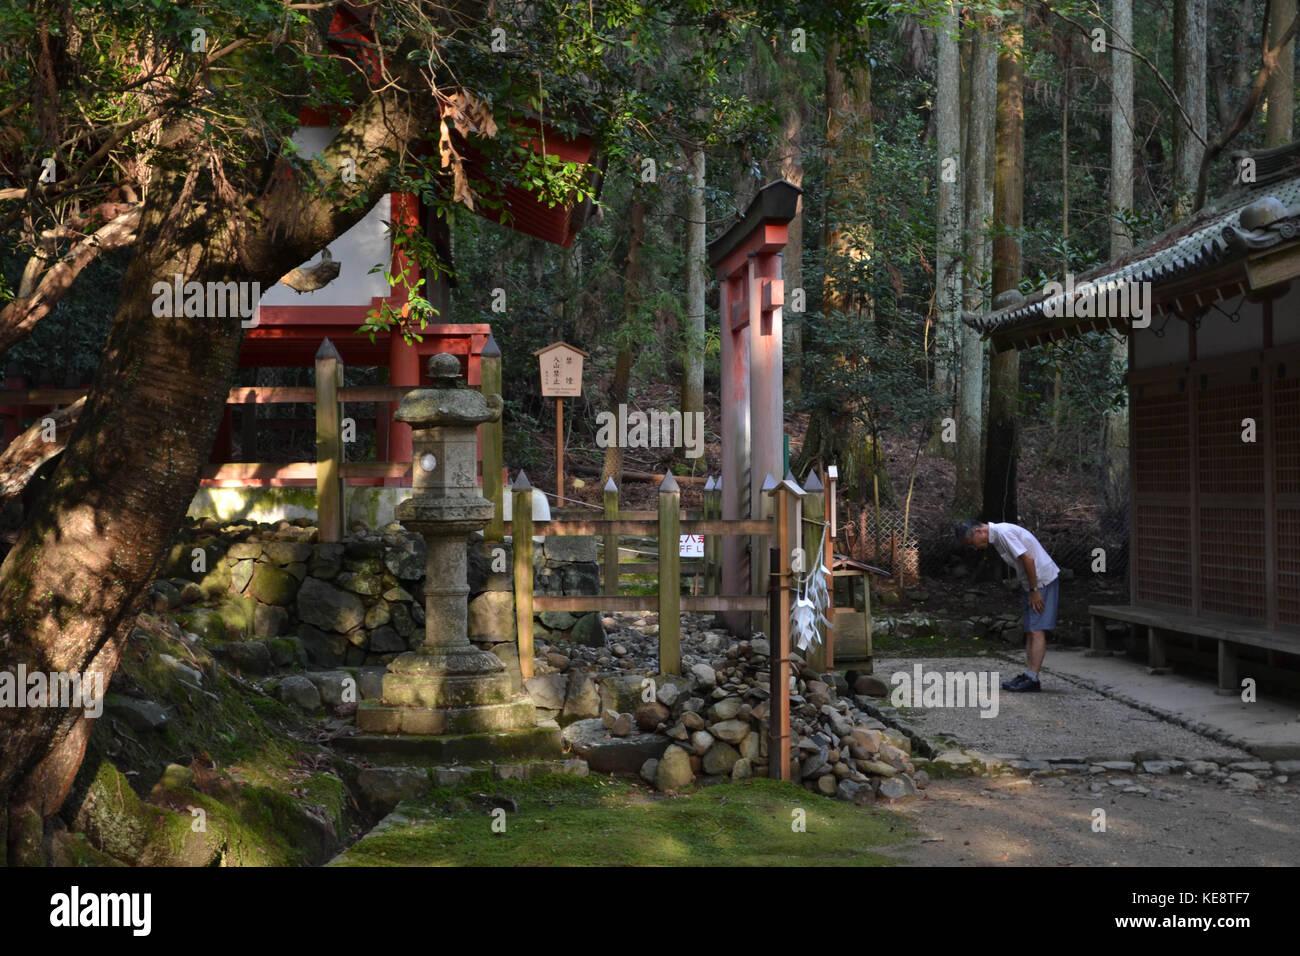 People praying at Kasuga Taisha, the famous shrine in Nara (Japan). Pic was taken in August 2017. - Stock Image